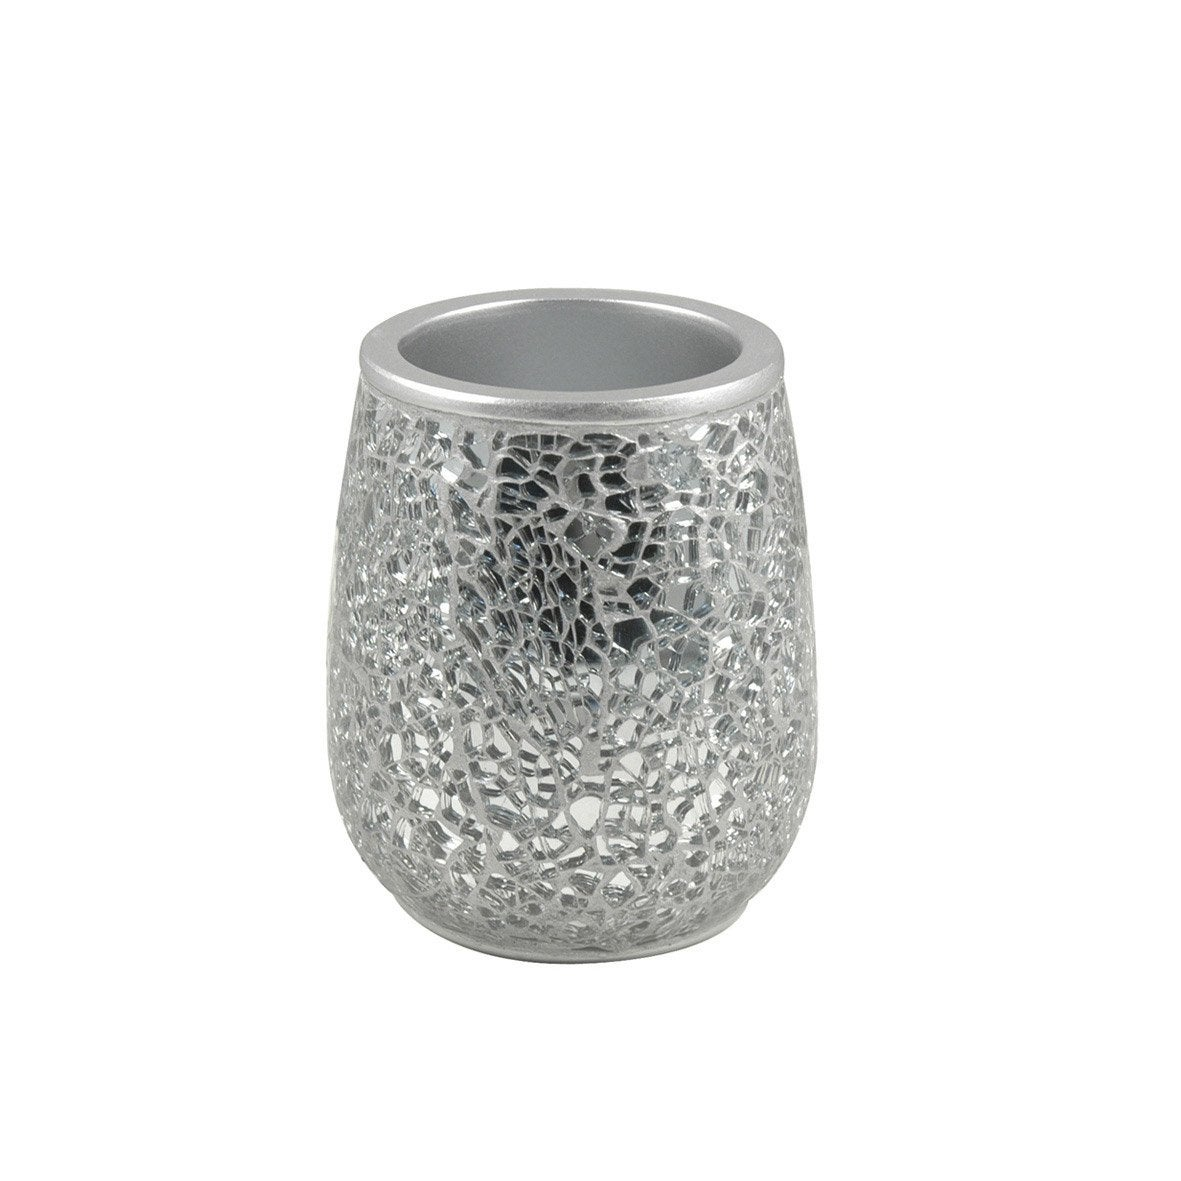 Gobelet polyrésine Glam, argent | Leroy Merlin